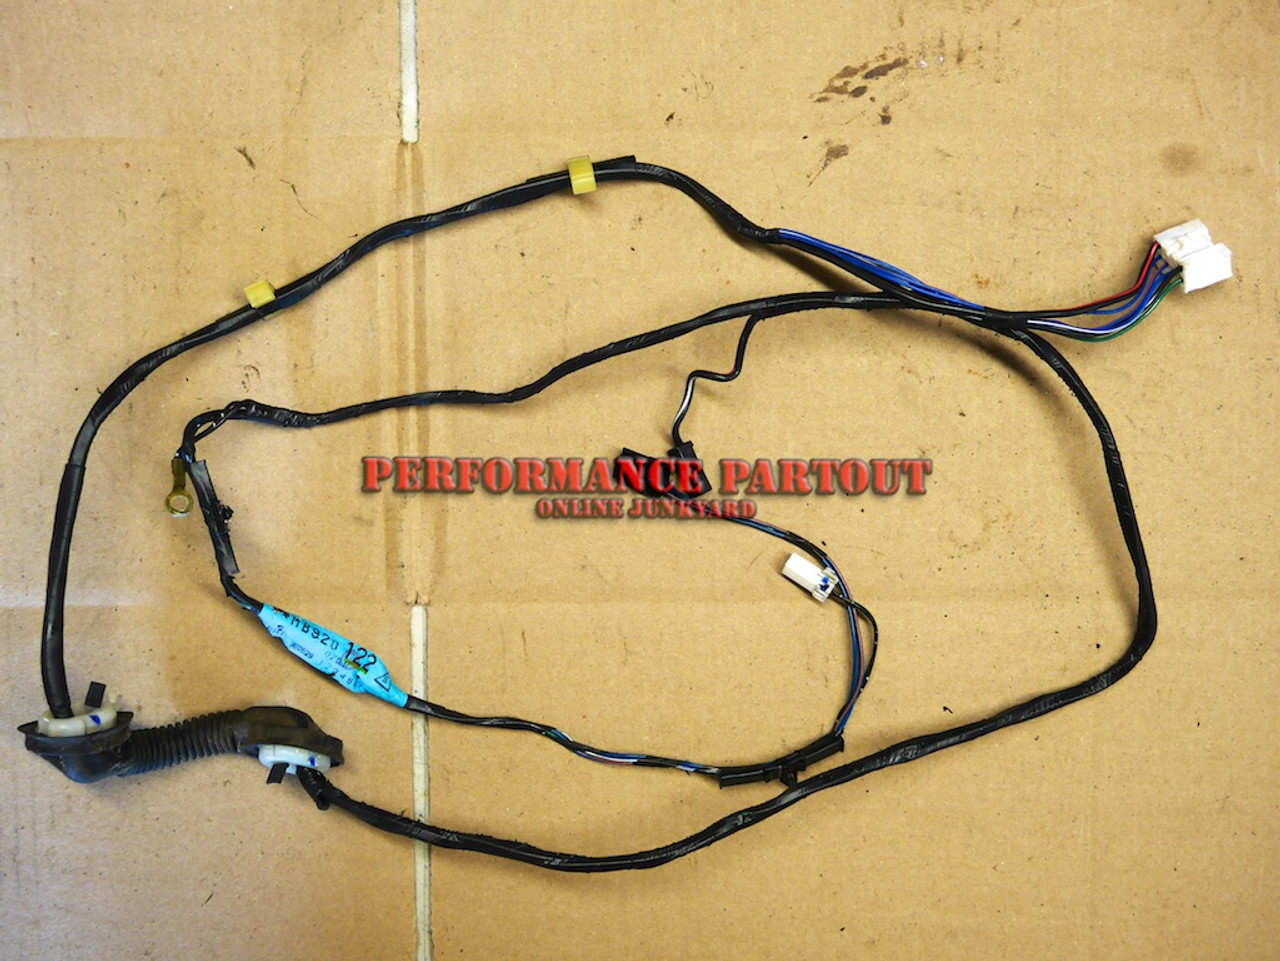 medium resolution of  oxygen hatch wiring harness 2g dsm performance partout on safety harness nakamichi harness